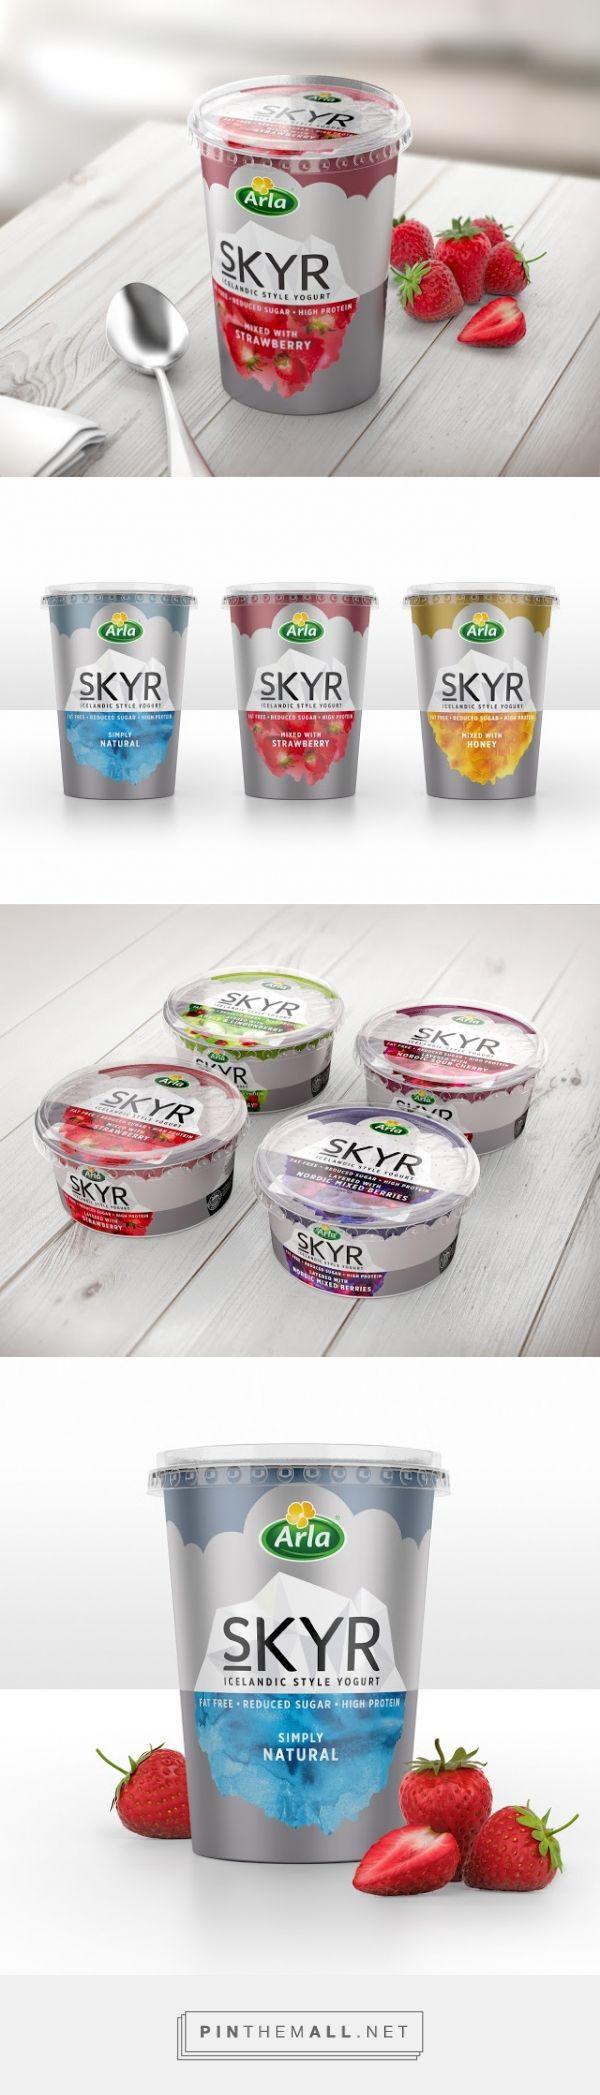 Arla Skyr #Yogurt #packaging designed by Elmwood Brand Design - http://www.packagingoftheworld.com/2015/04/arla-skyr-yogurt.html